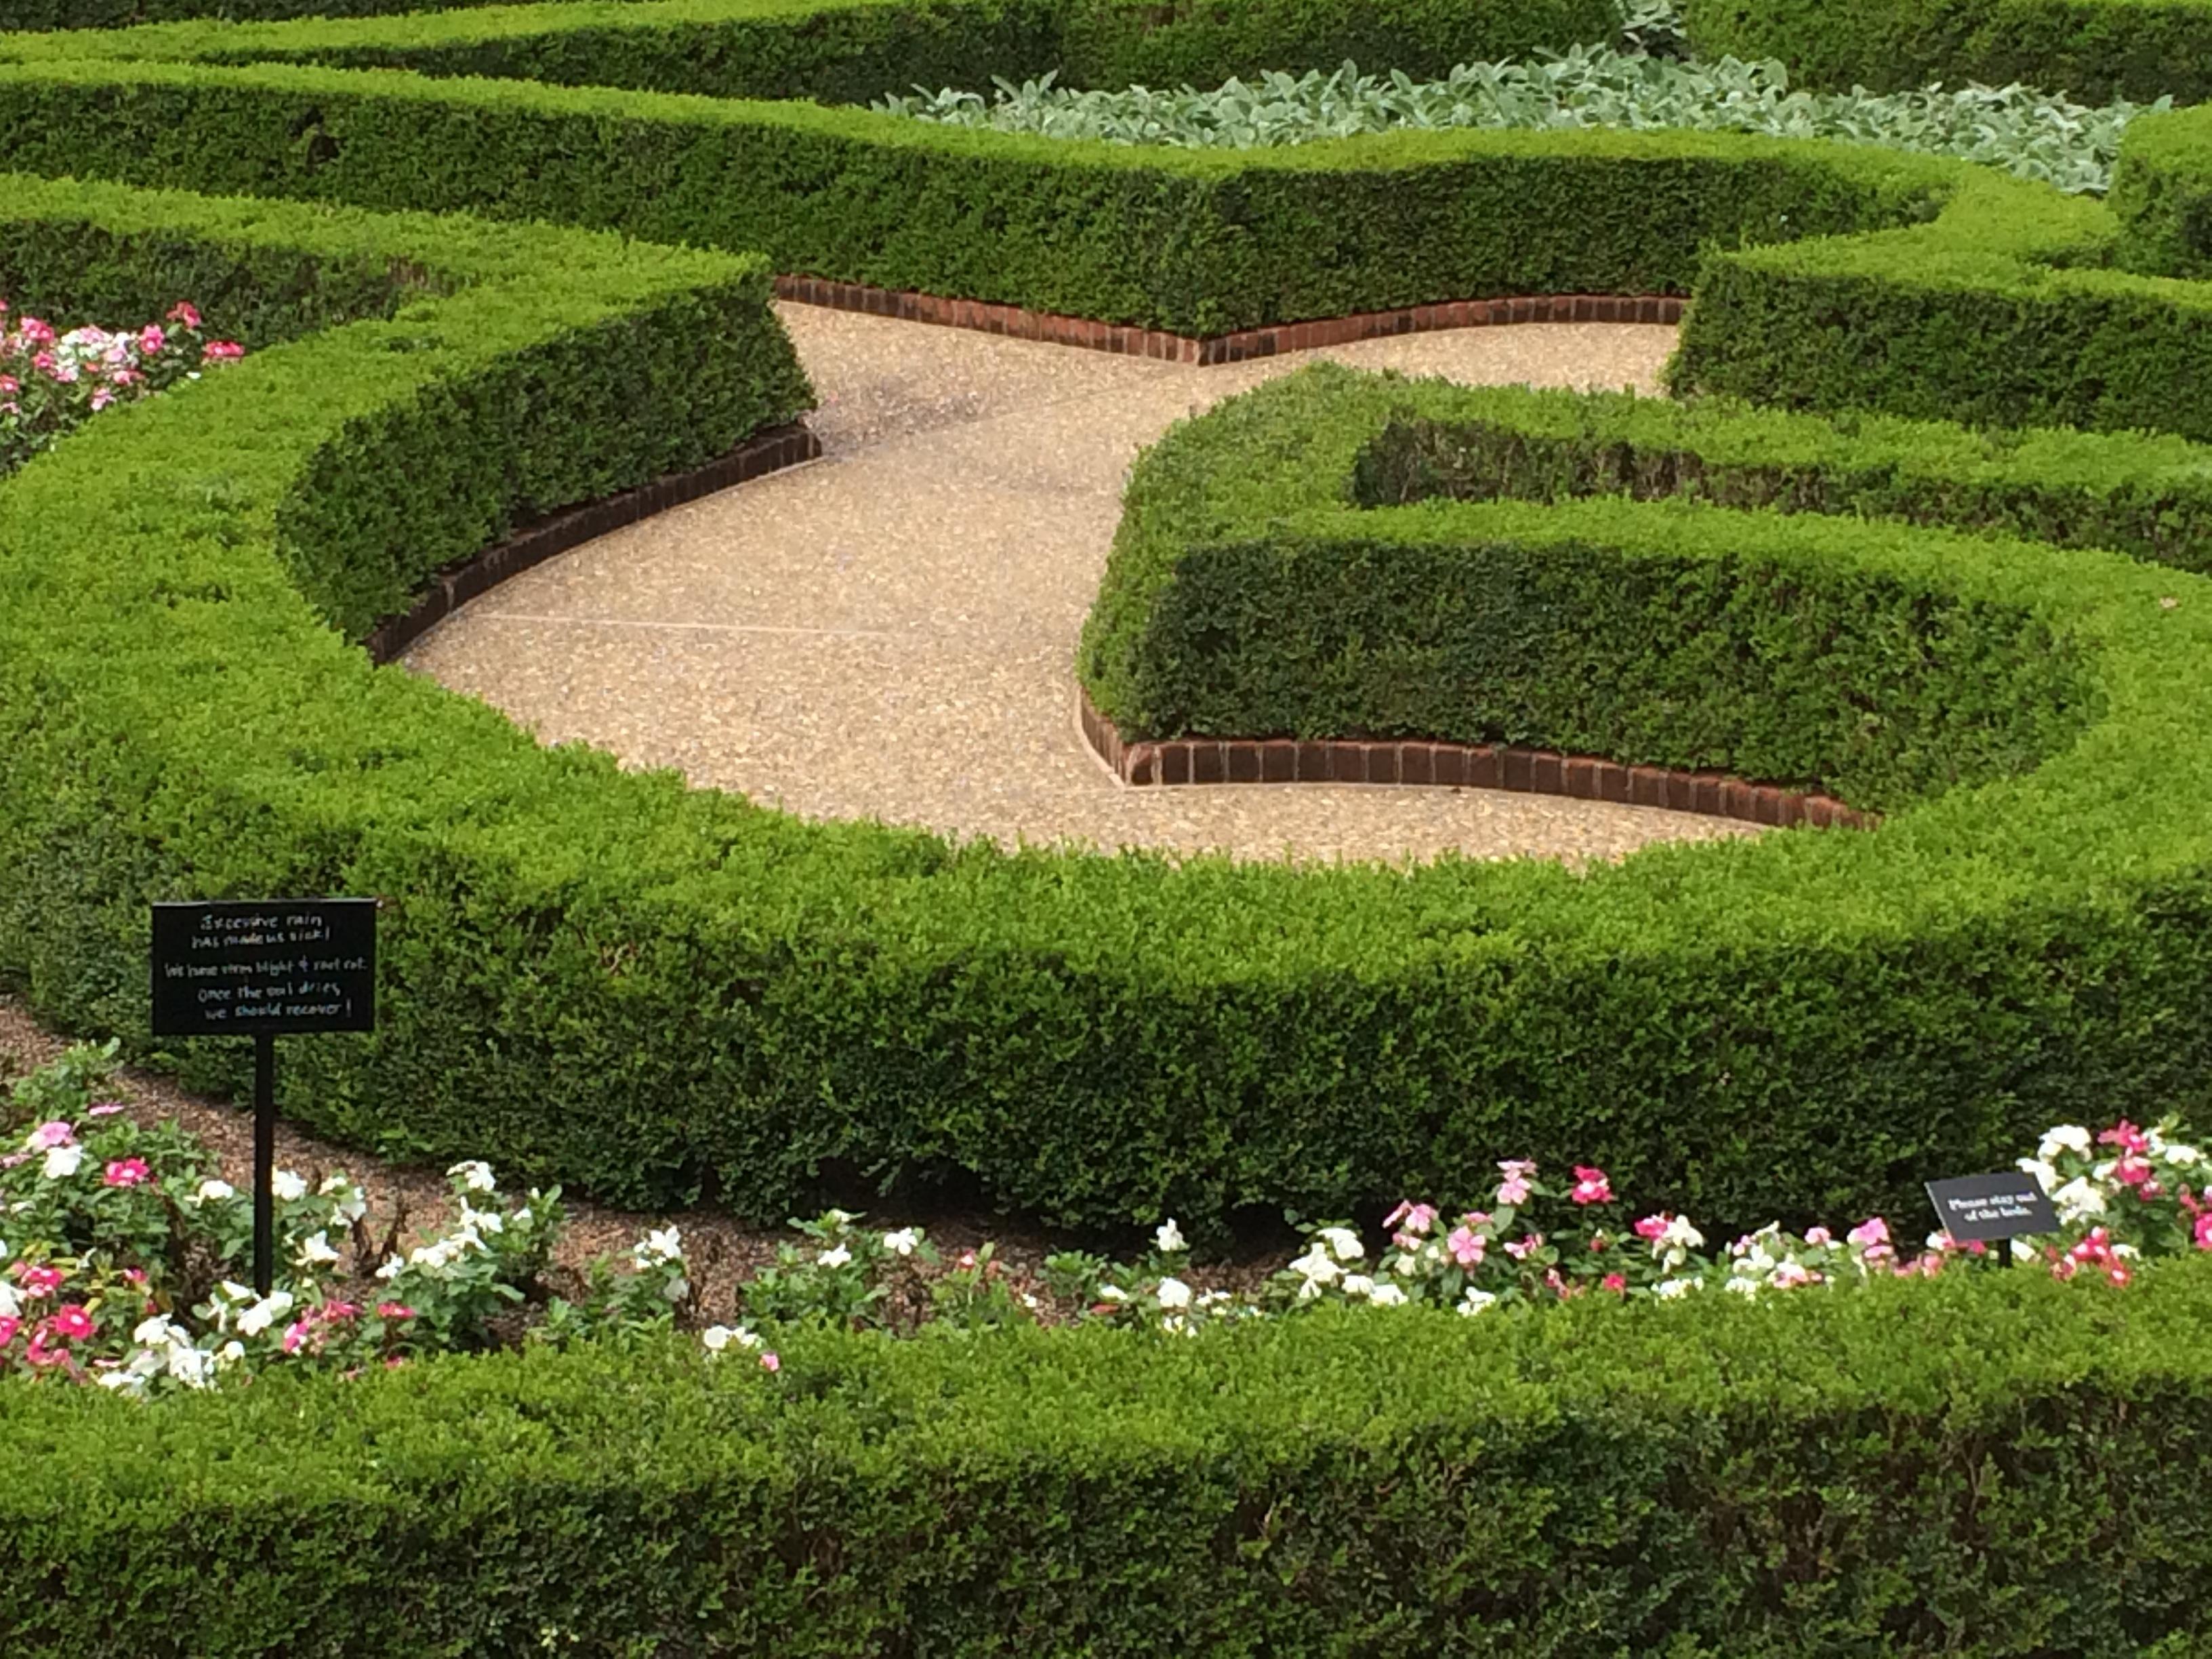 Landscape Grass Plant Field Lawn Meadow Flower Green Backyard Botany Garden  Flowers Landscaping Design Curves Shrub